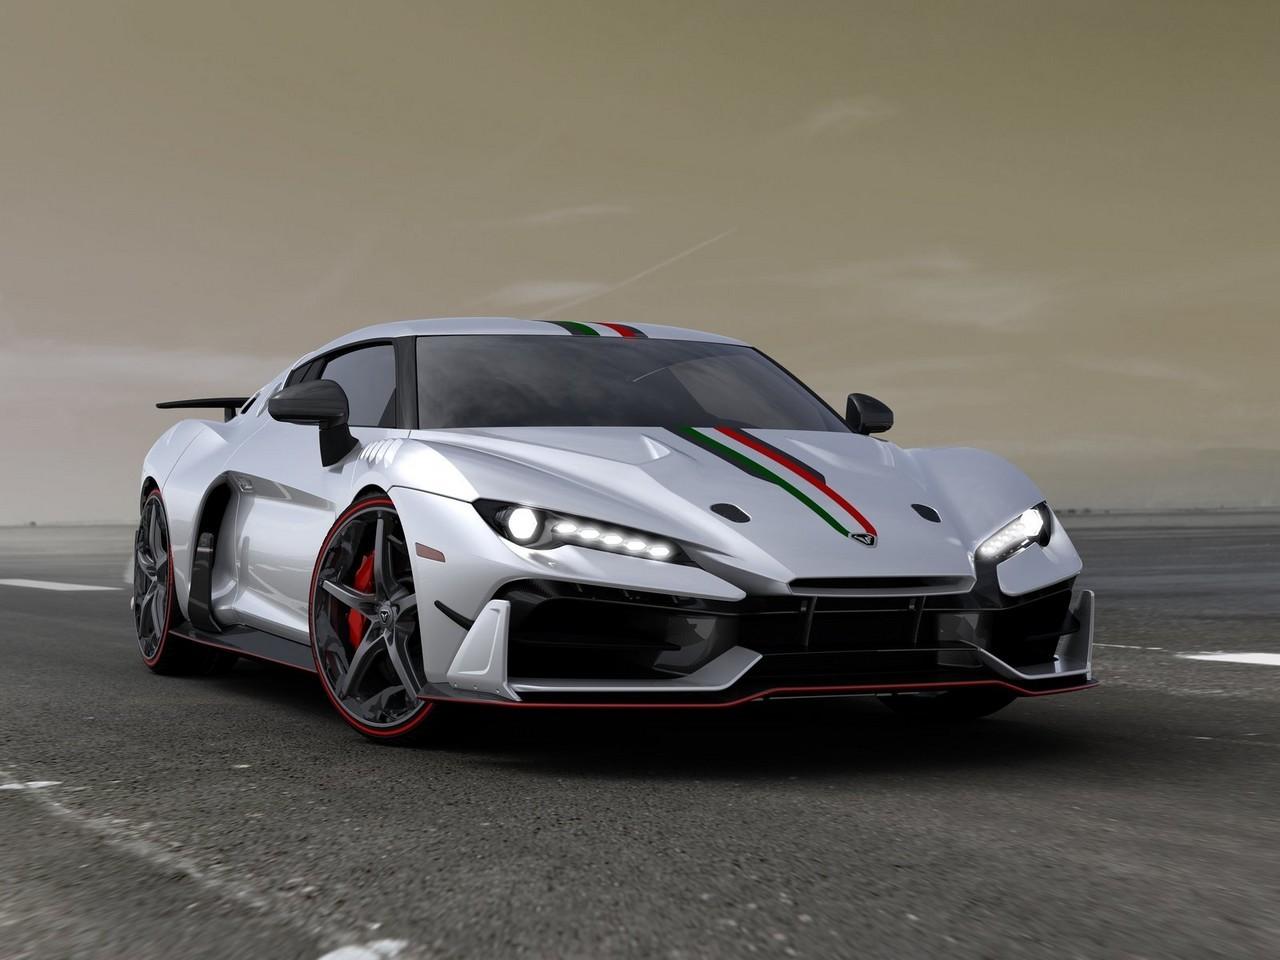 Italdesign Zerouno 2017: les 5 exemplaires de la supercar sont vendu